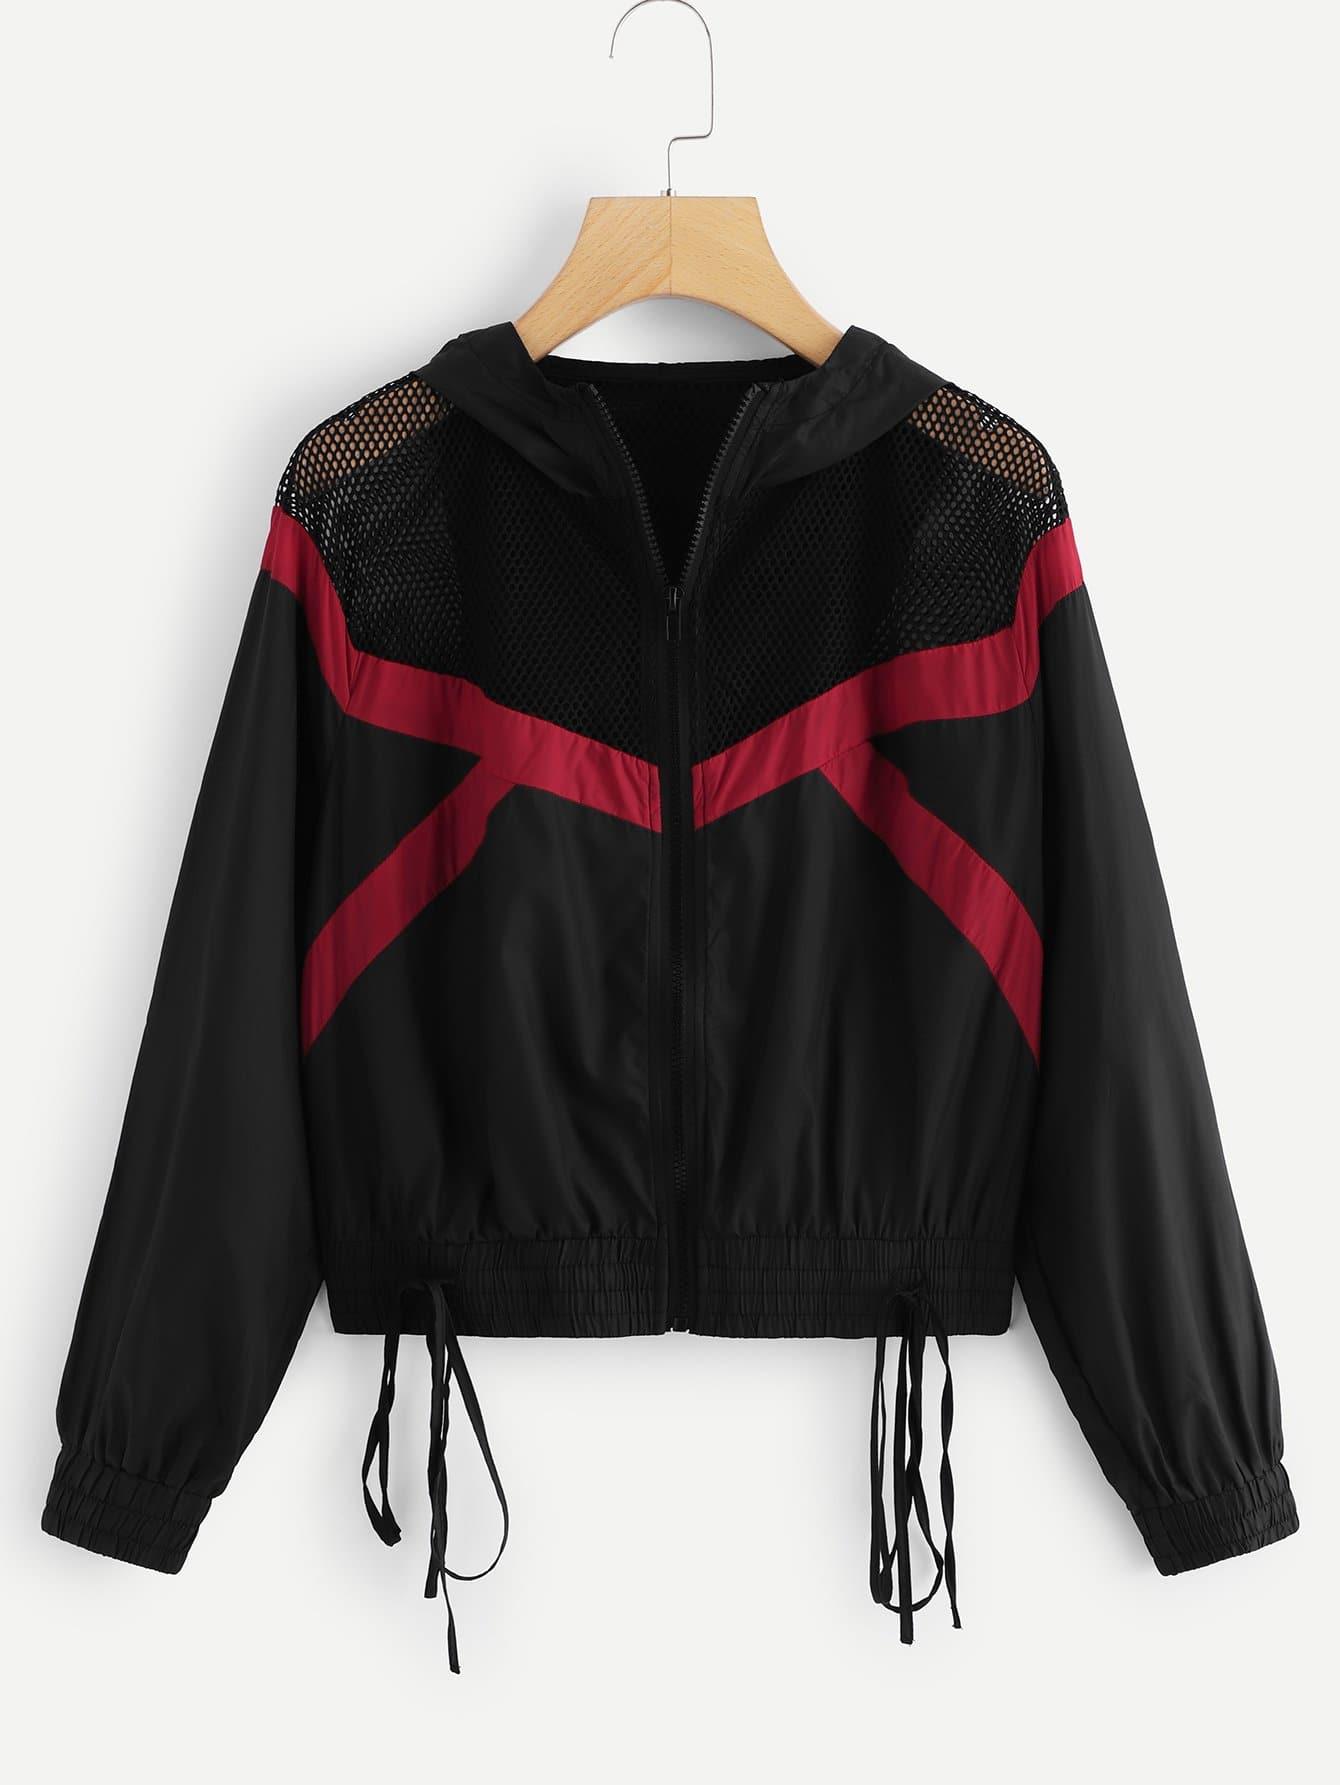 Mesh Insert Cut and Sew Knot Hem Hooded Jacket